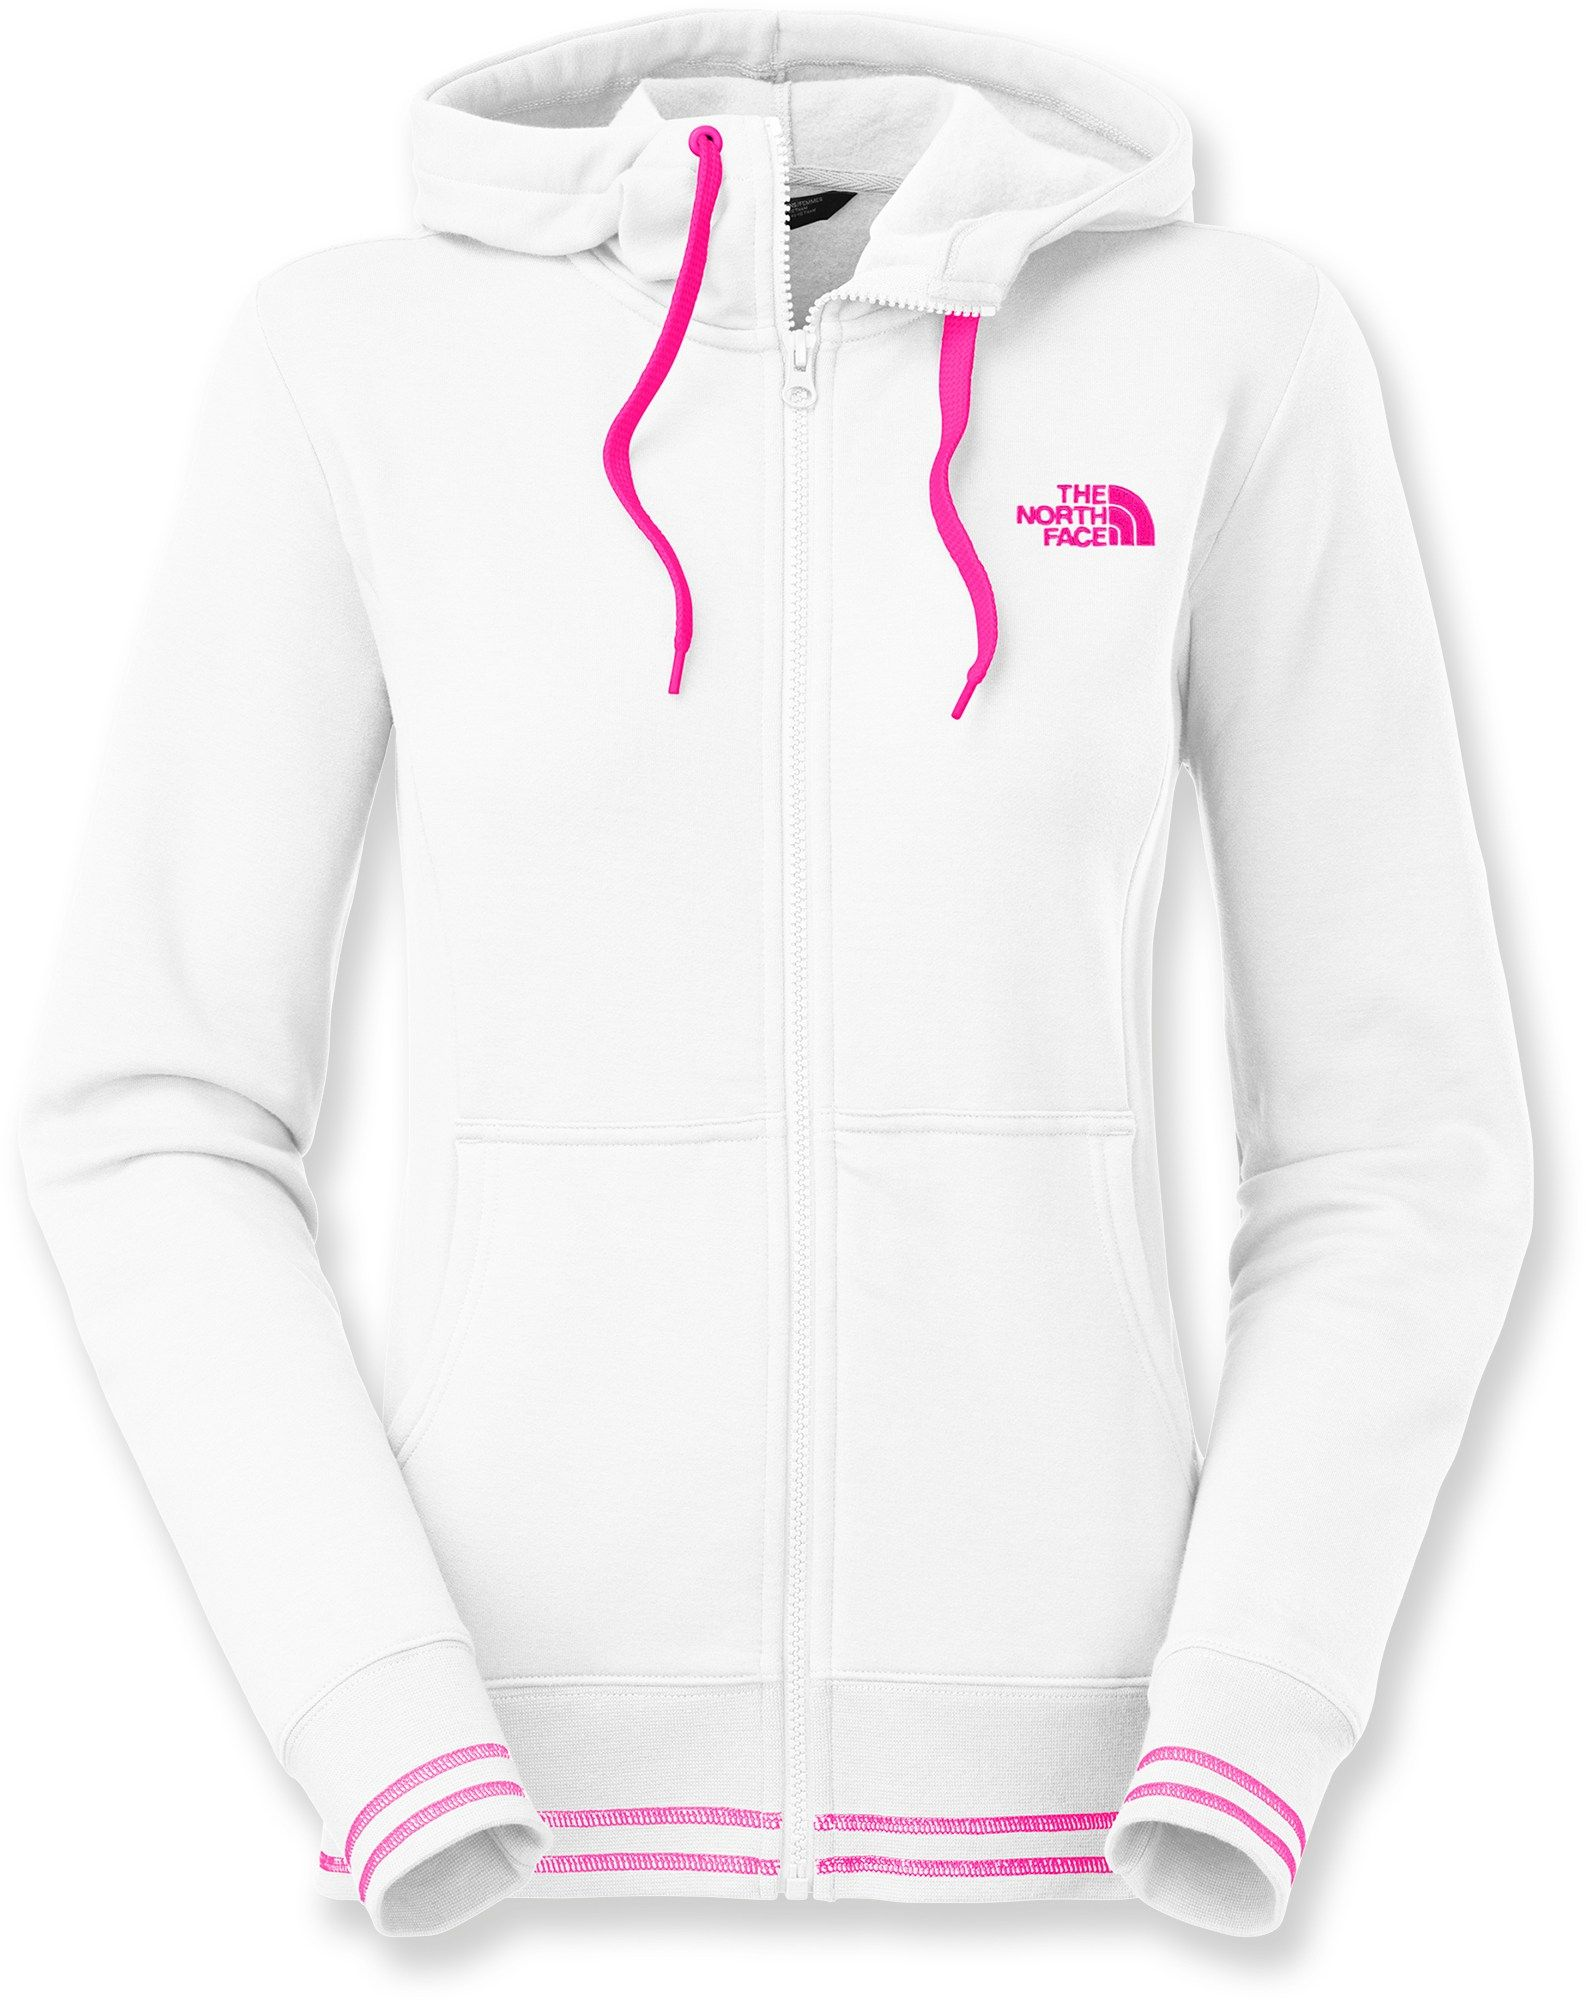 bcbda46dd The North Face Female Logo Stretch Full-Zip Hoodie - Women's ...